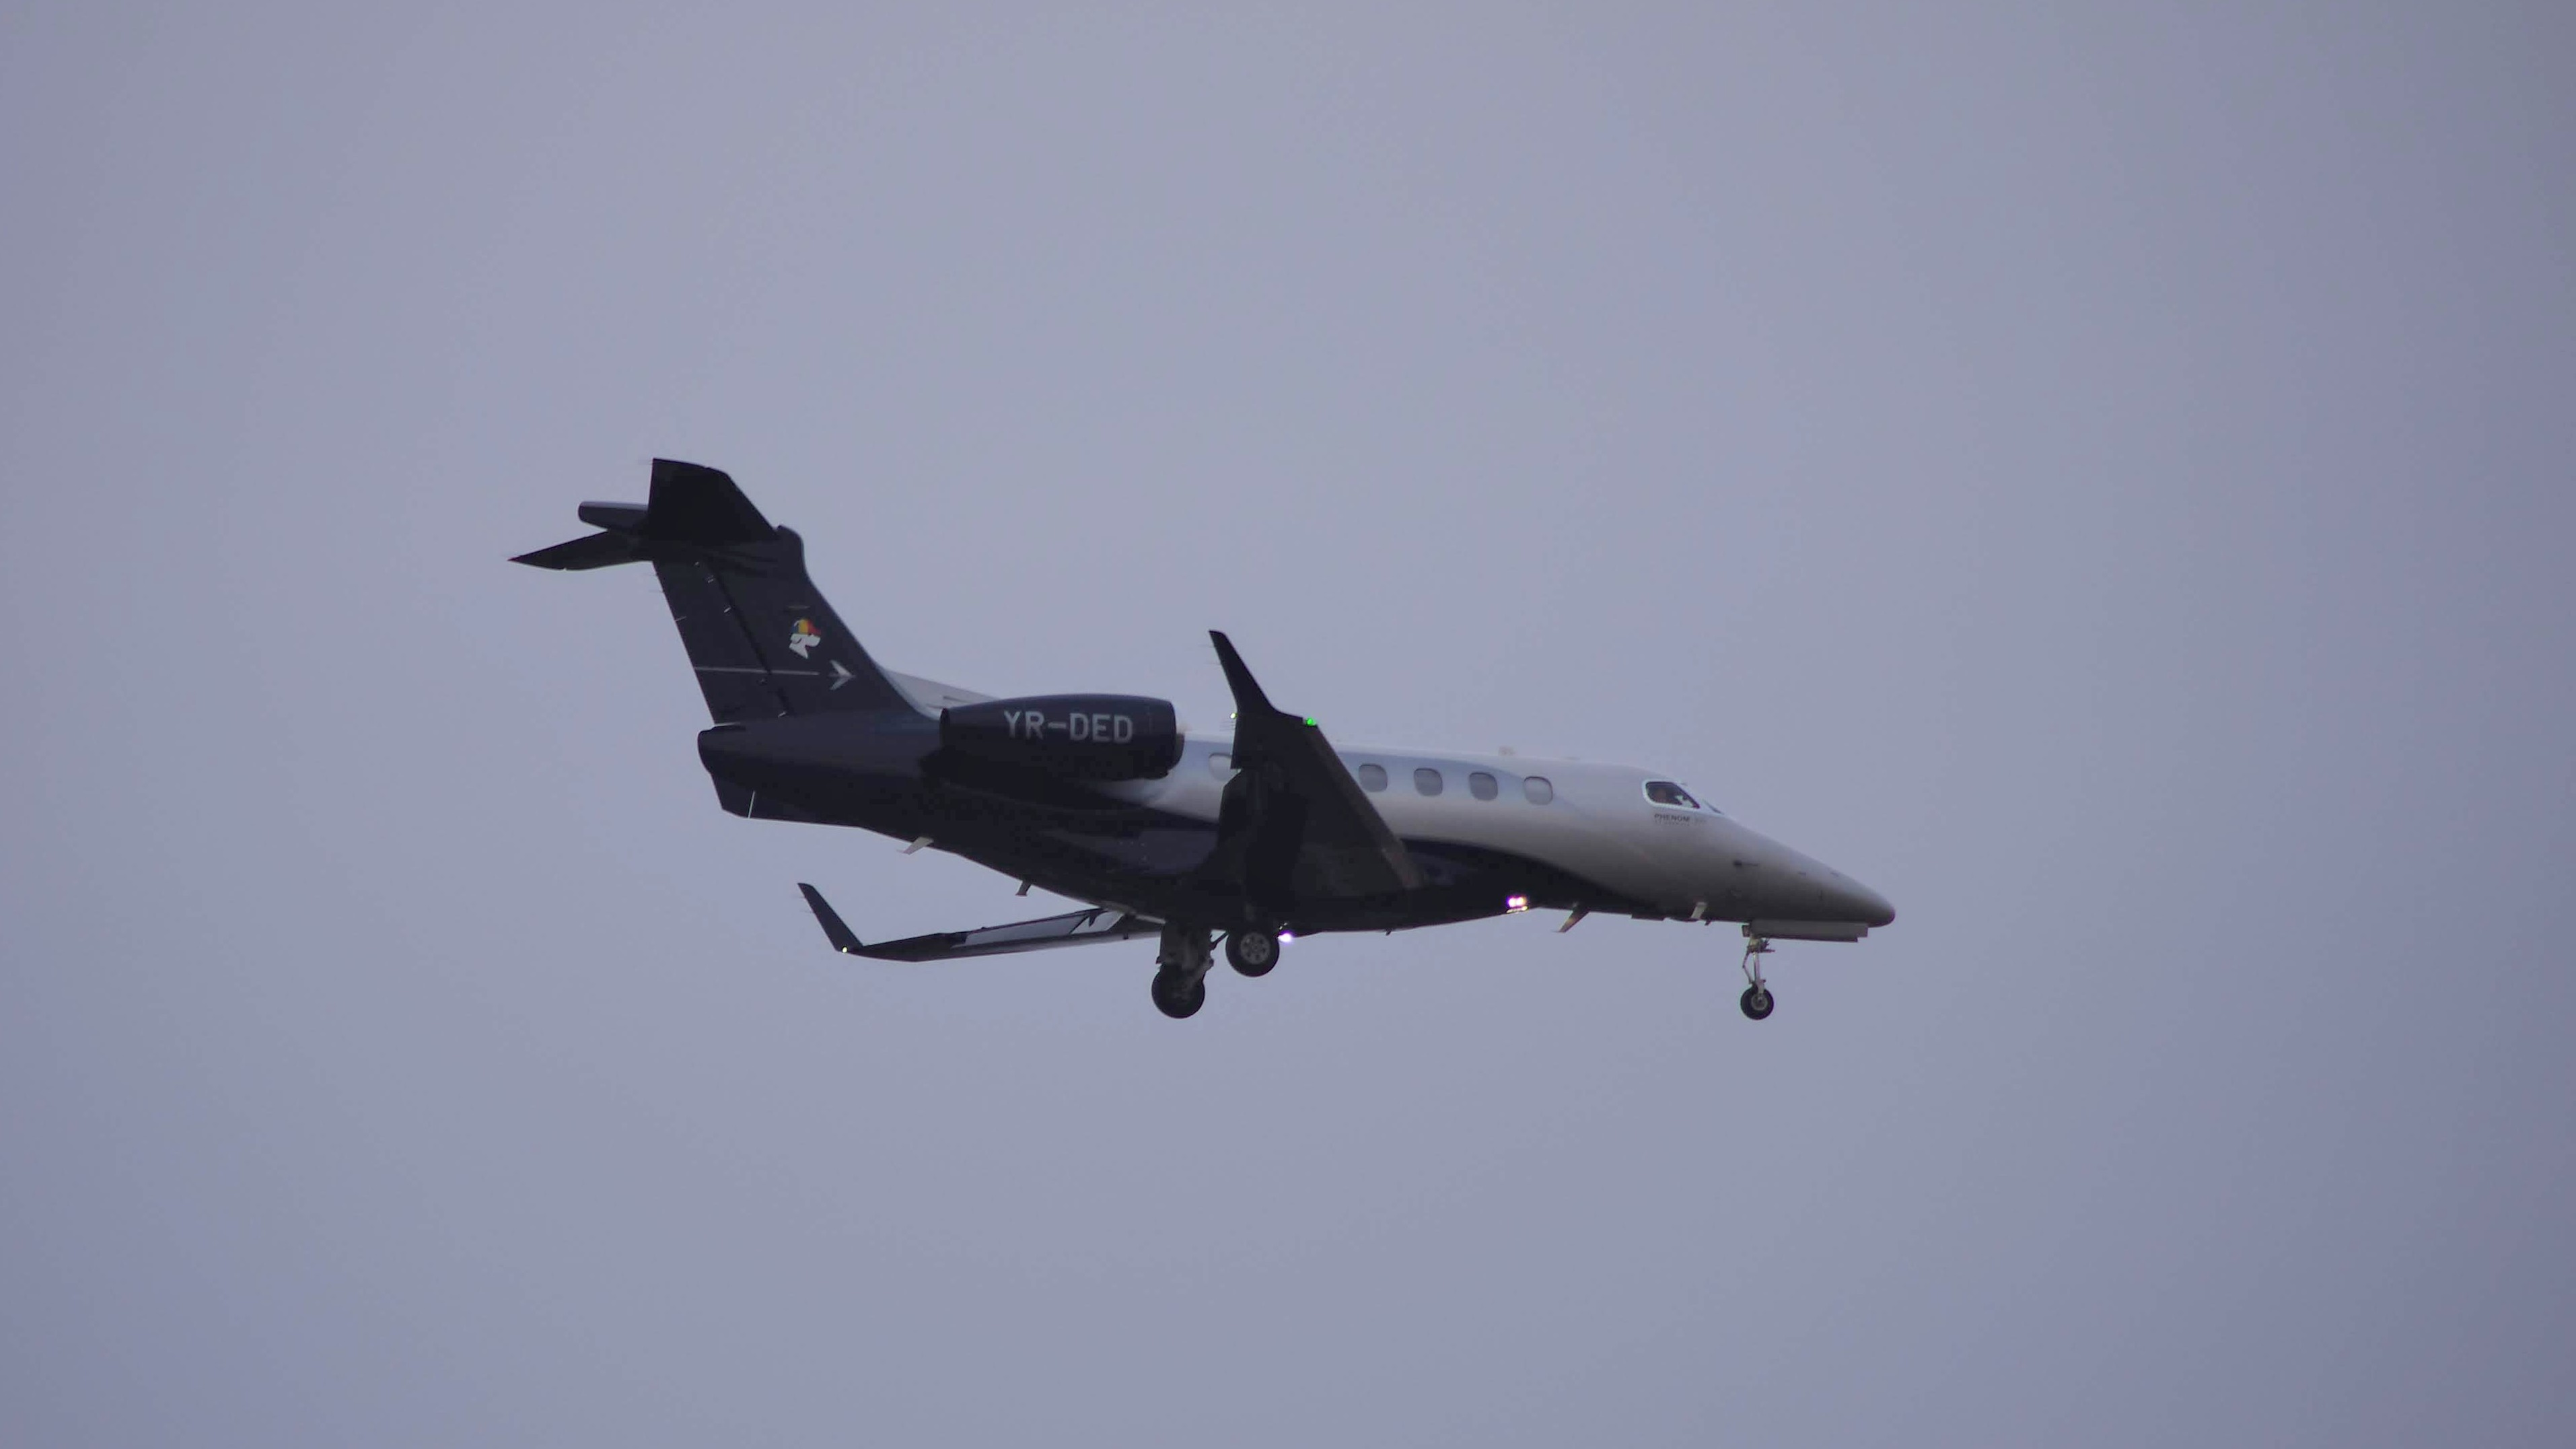 YR-DED Embraer Phenom 300